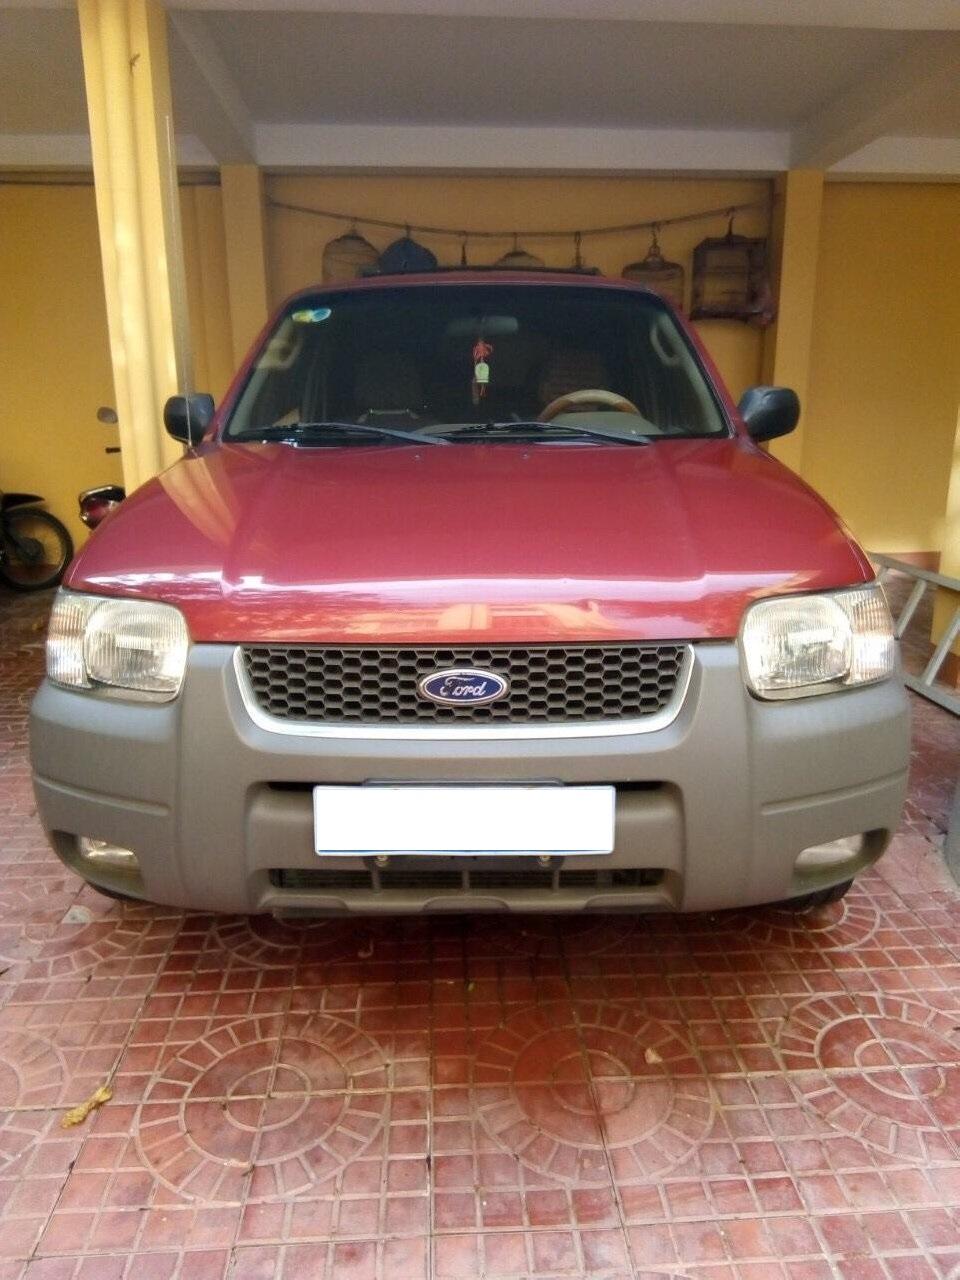 Bán xe Ford Escape XLT năm 2003, màu đỏ